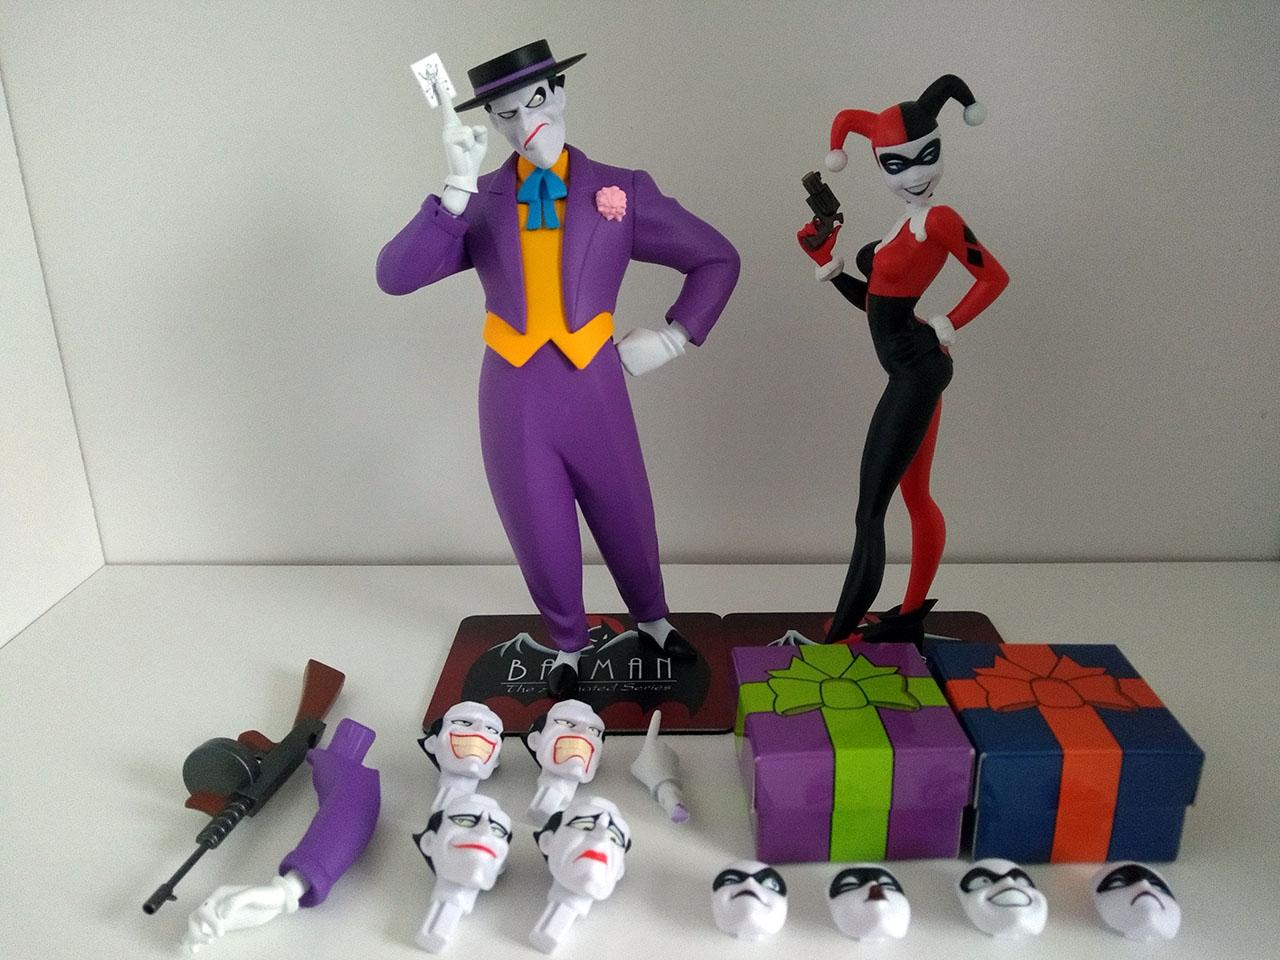 Tous les accessoires de The Joker & Harley Quinn - ARTFX+ - Kotobukiya